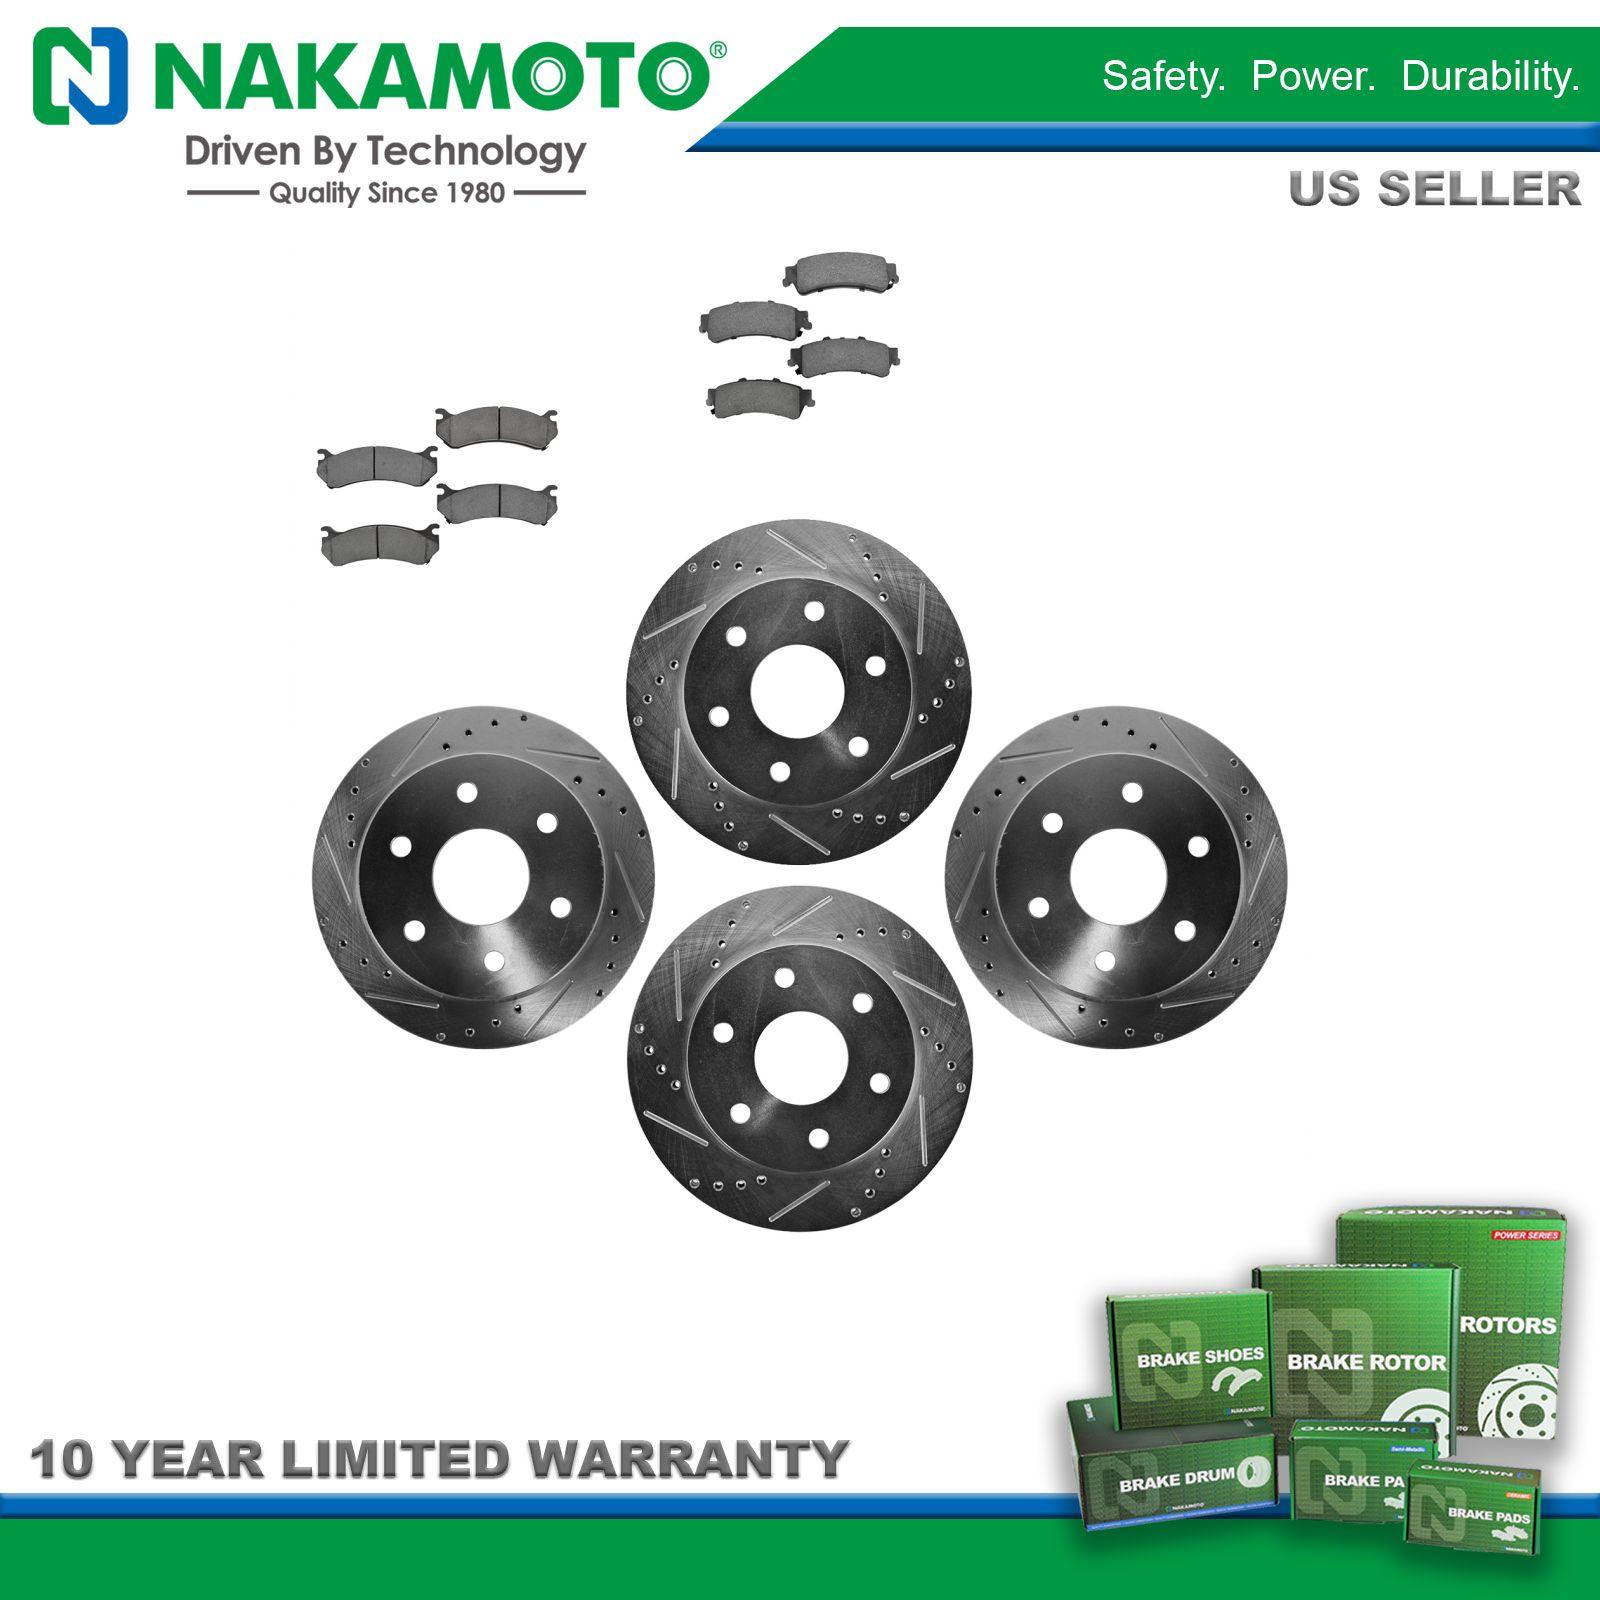 Nakamoto Rotor /& Brake Pad Kit Ceramic Performance Drilled Slotted Front Rear